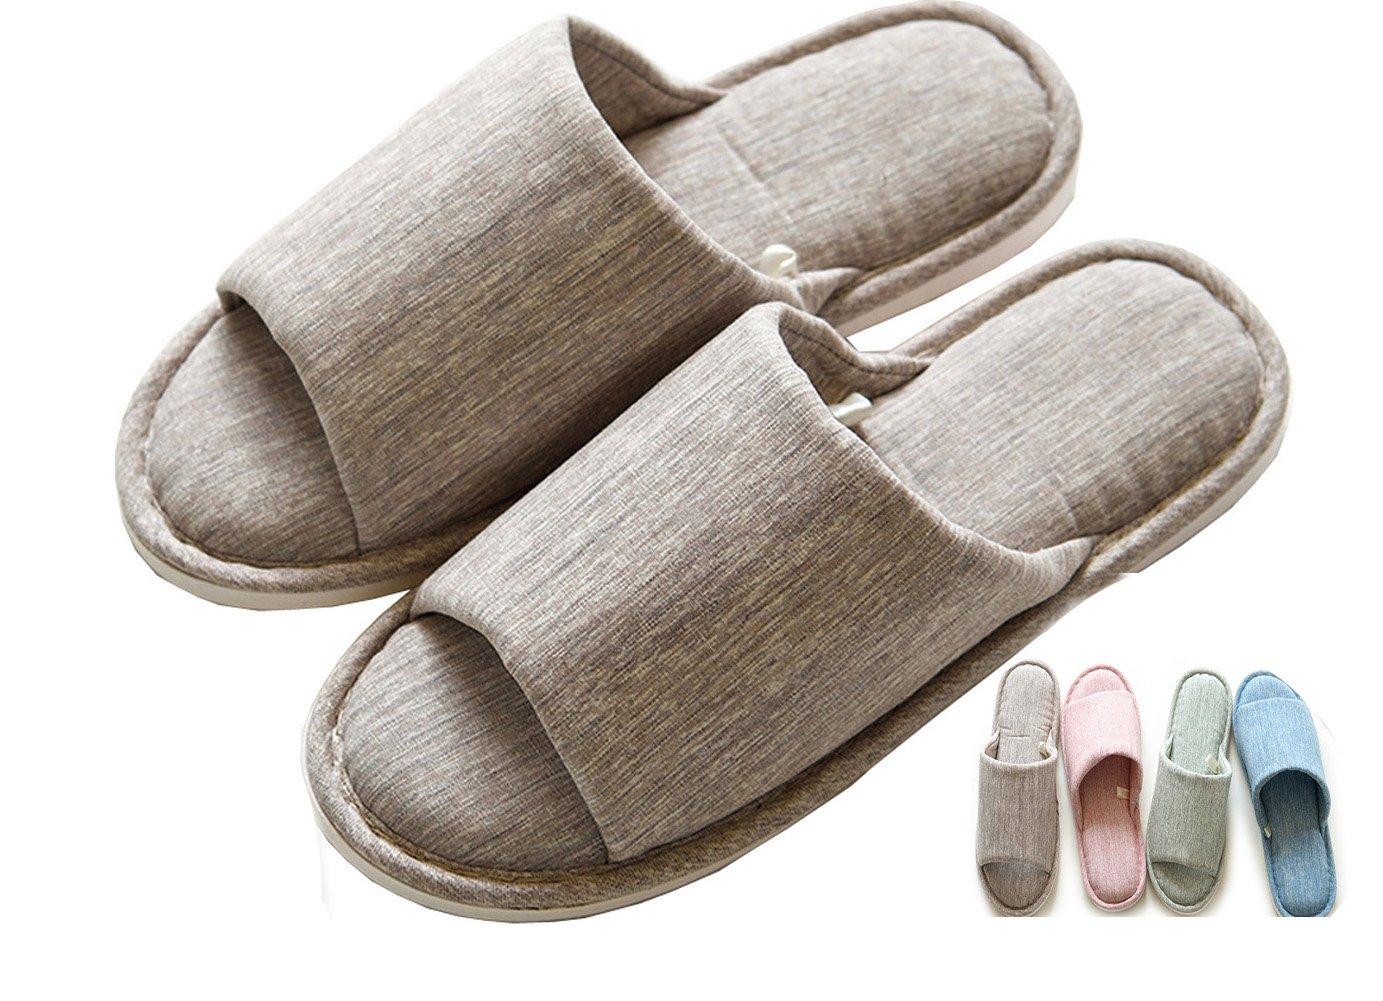 Lijeer Men Indoor Home Slippers Women Cotton Cozy Memory Foam Flax House Casual House Open-Toes Striped Slide Gray US7.5-8=EU40-41=UK6.5-7